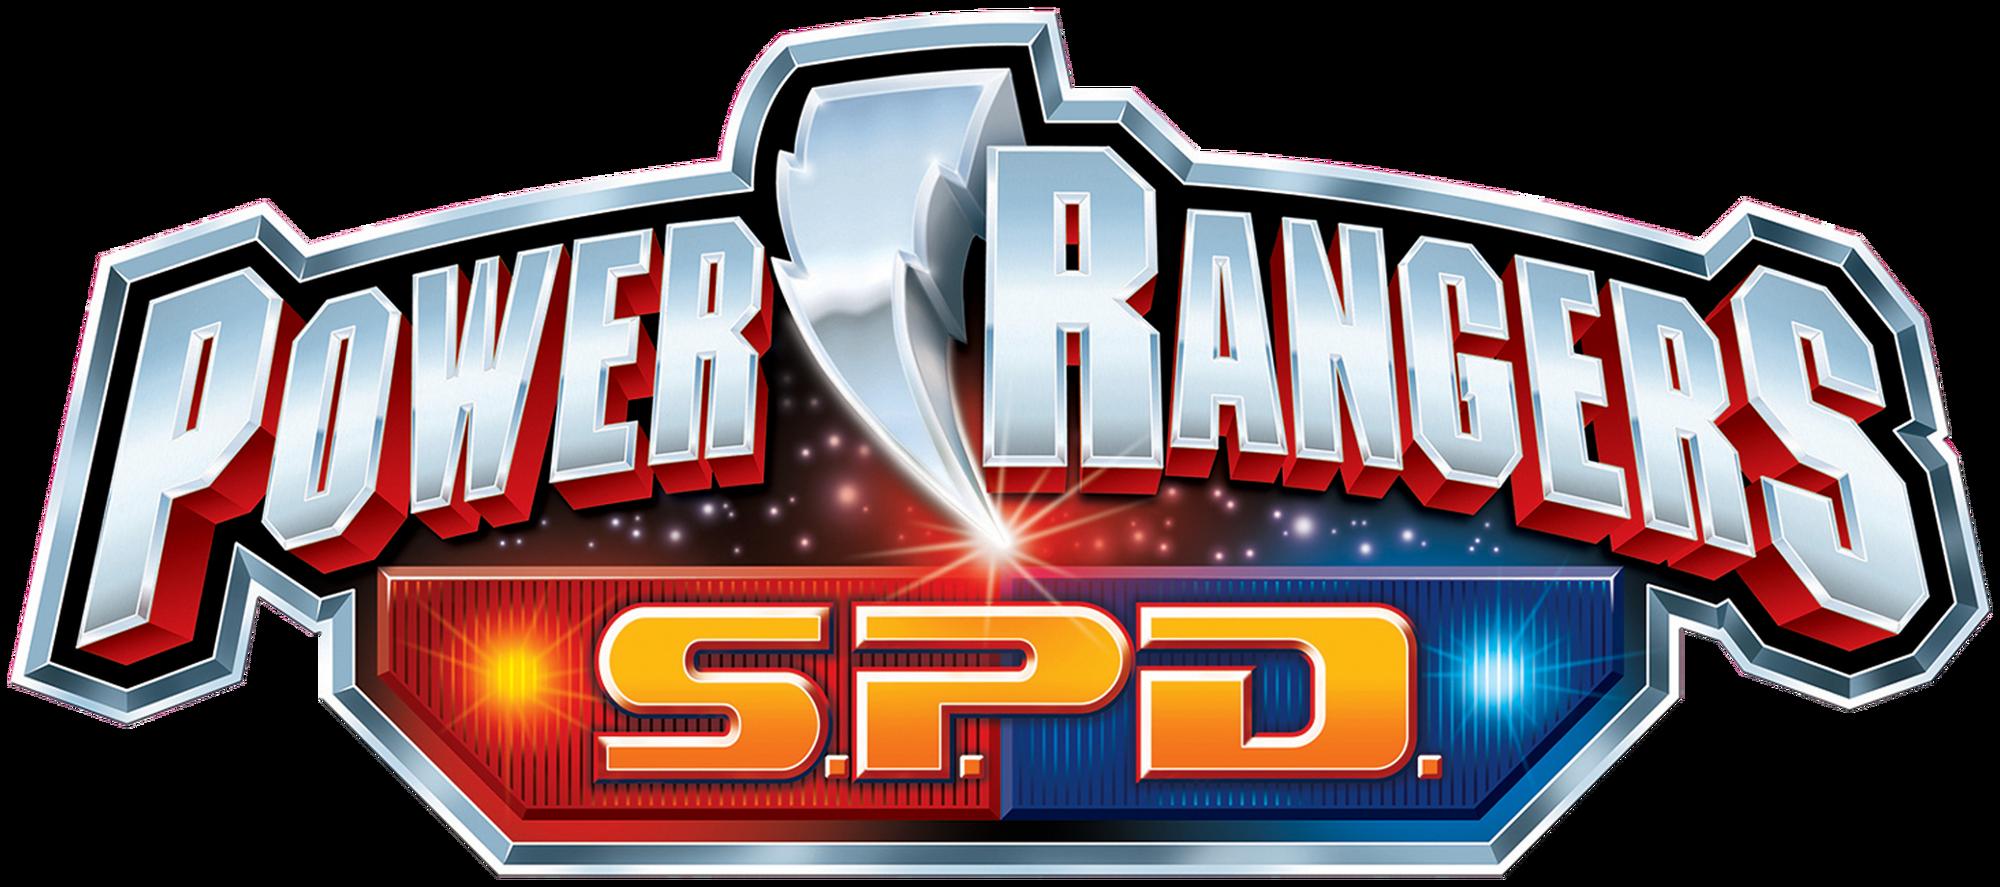 Power Rangers S P D Rangerwiki Fandom Powered By Wikia